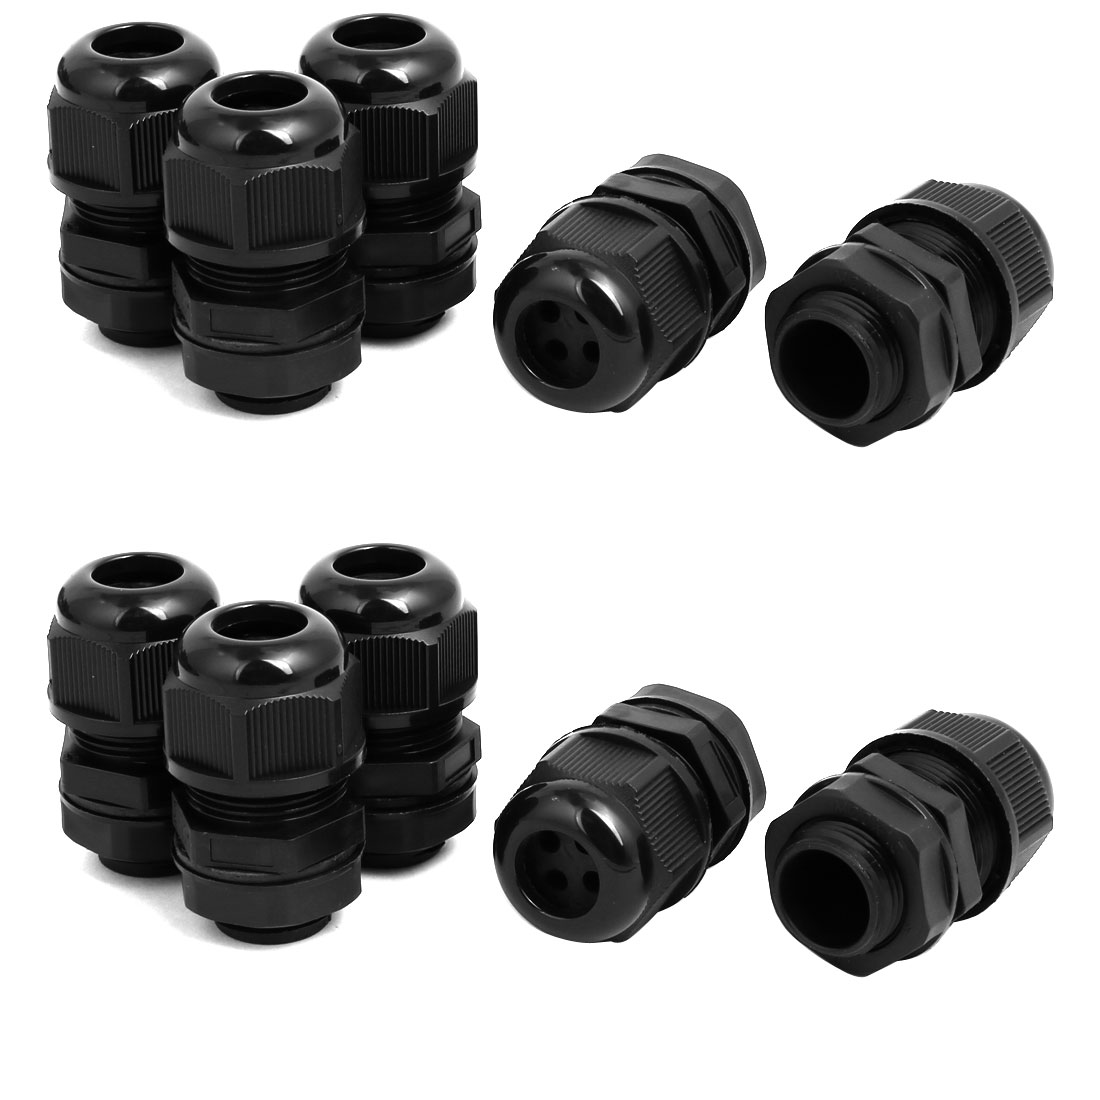 M20 x1.5mm 2mm-3.2mm 4 Holes Adjustable Cables Gland Black 10pcs